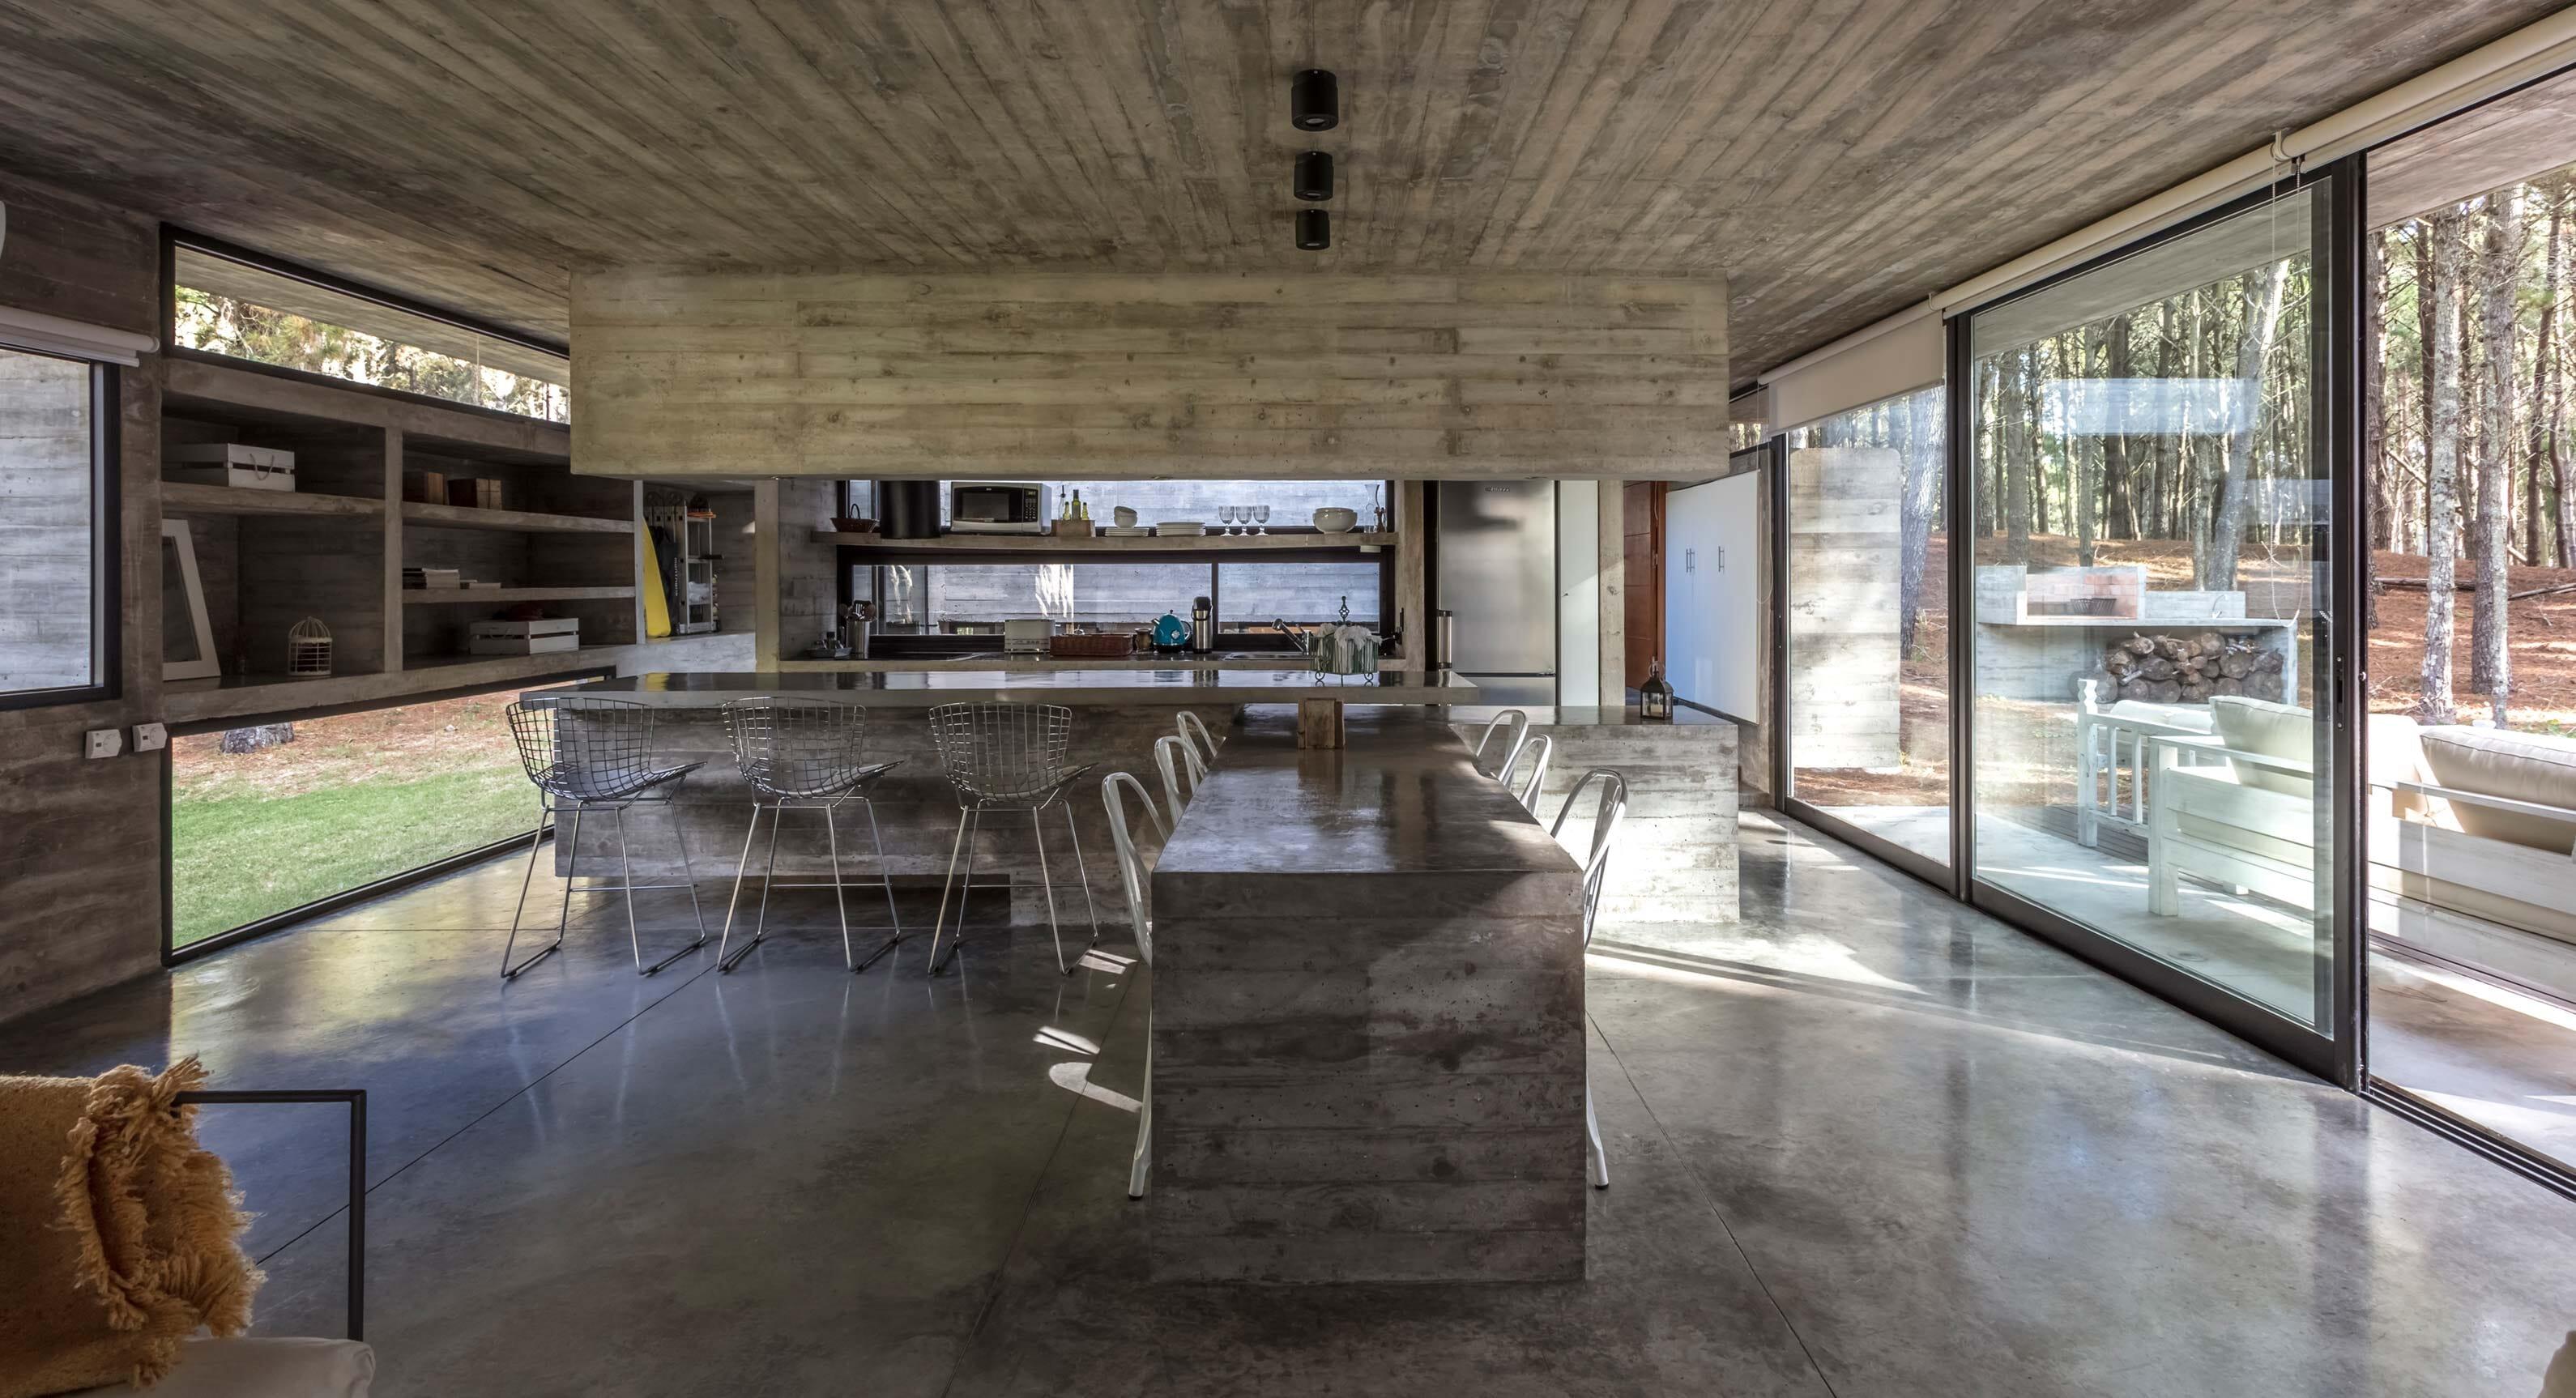 Besonías Almeida Arquitectos' Concrete Summer House